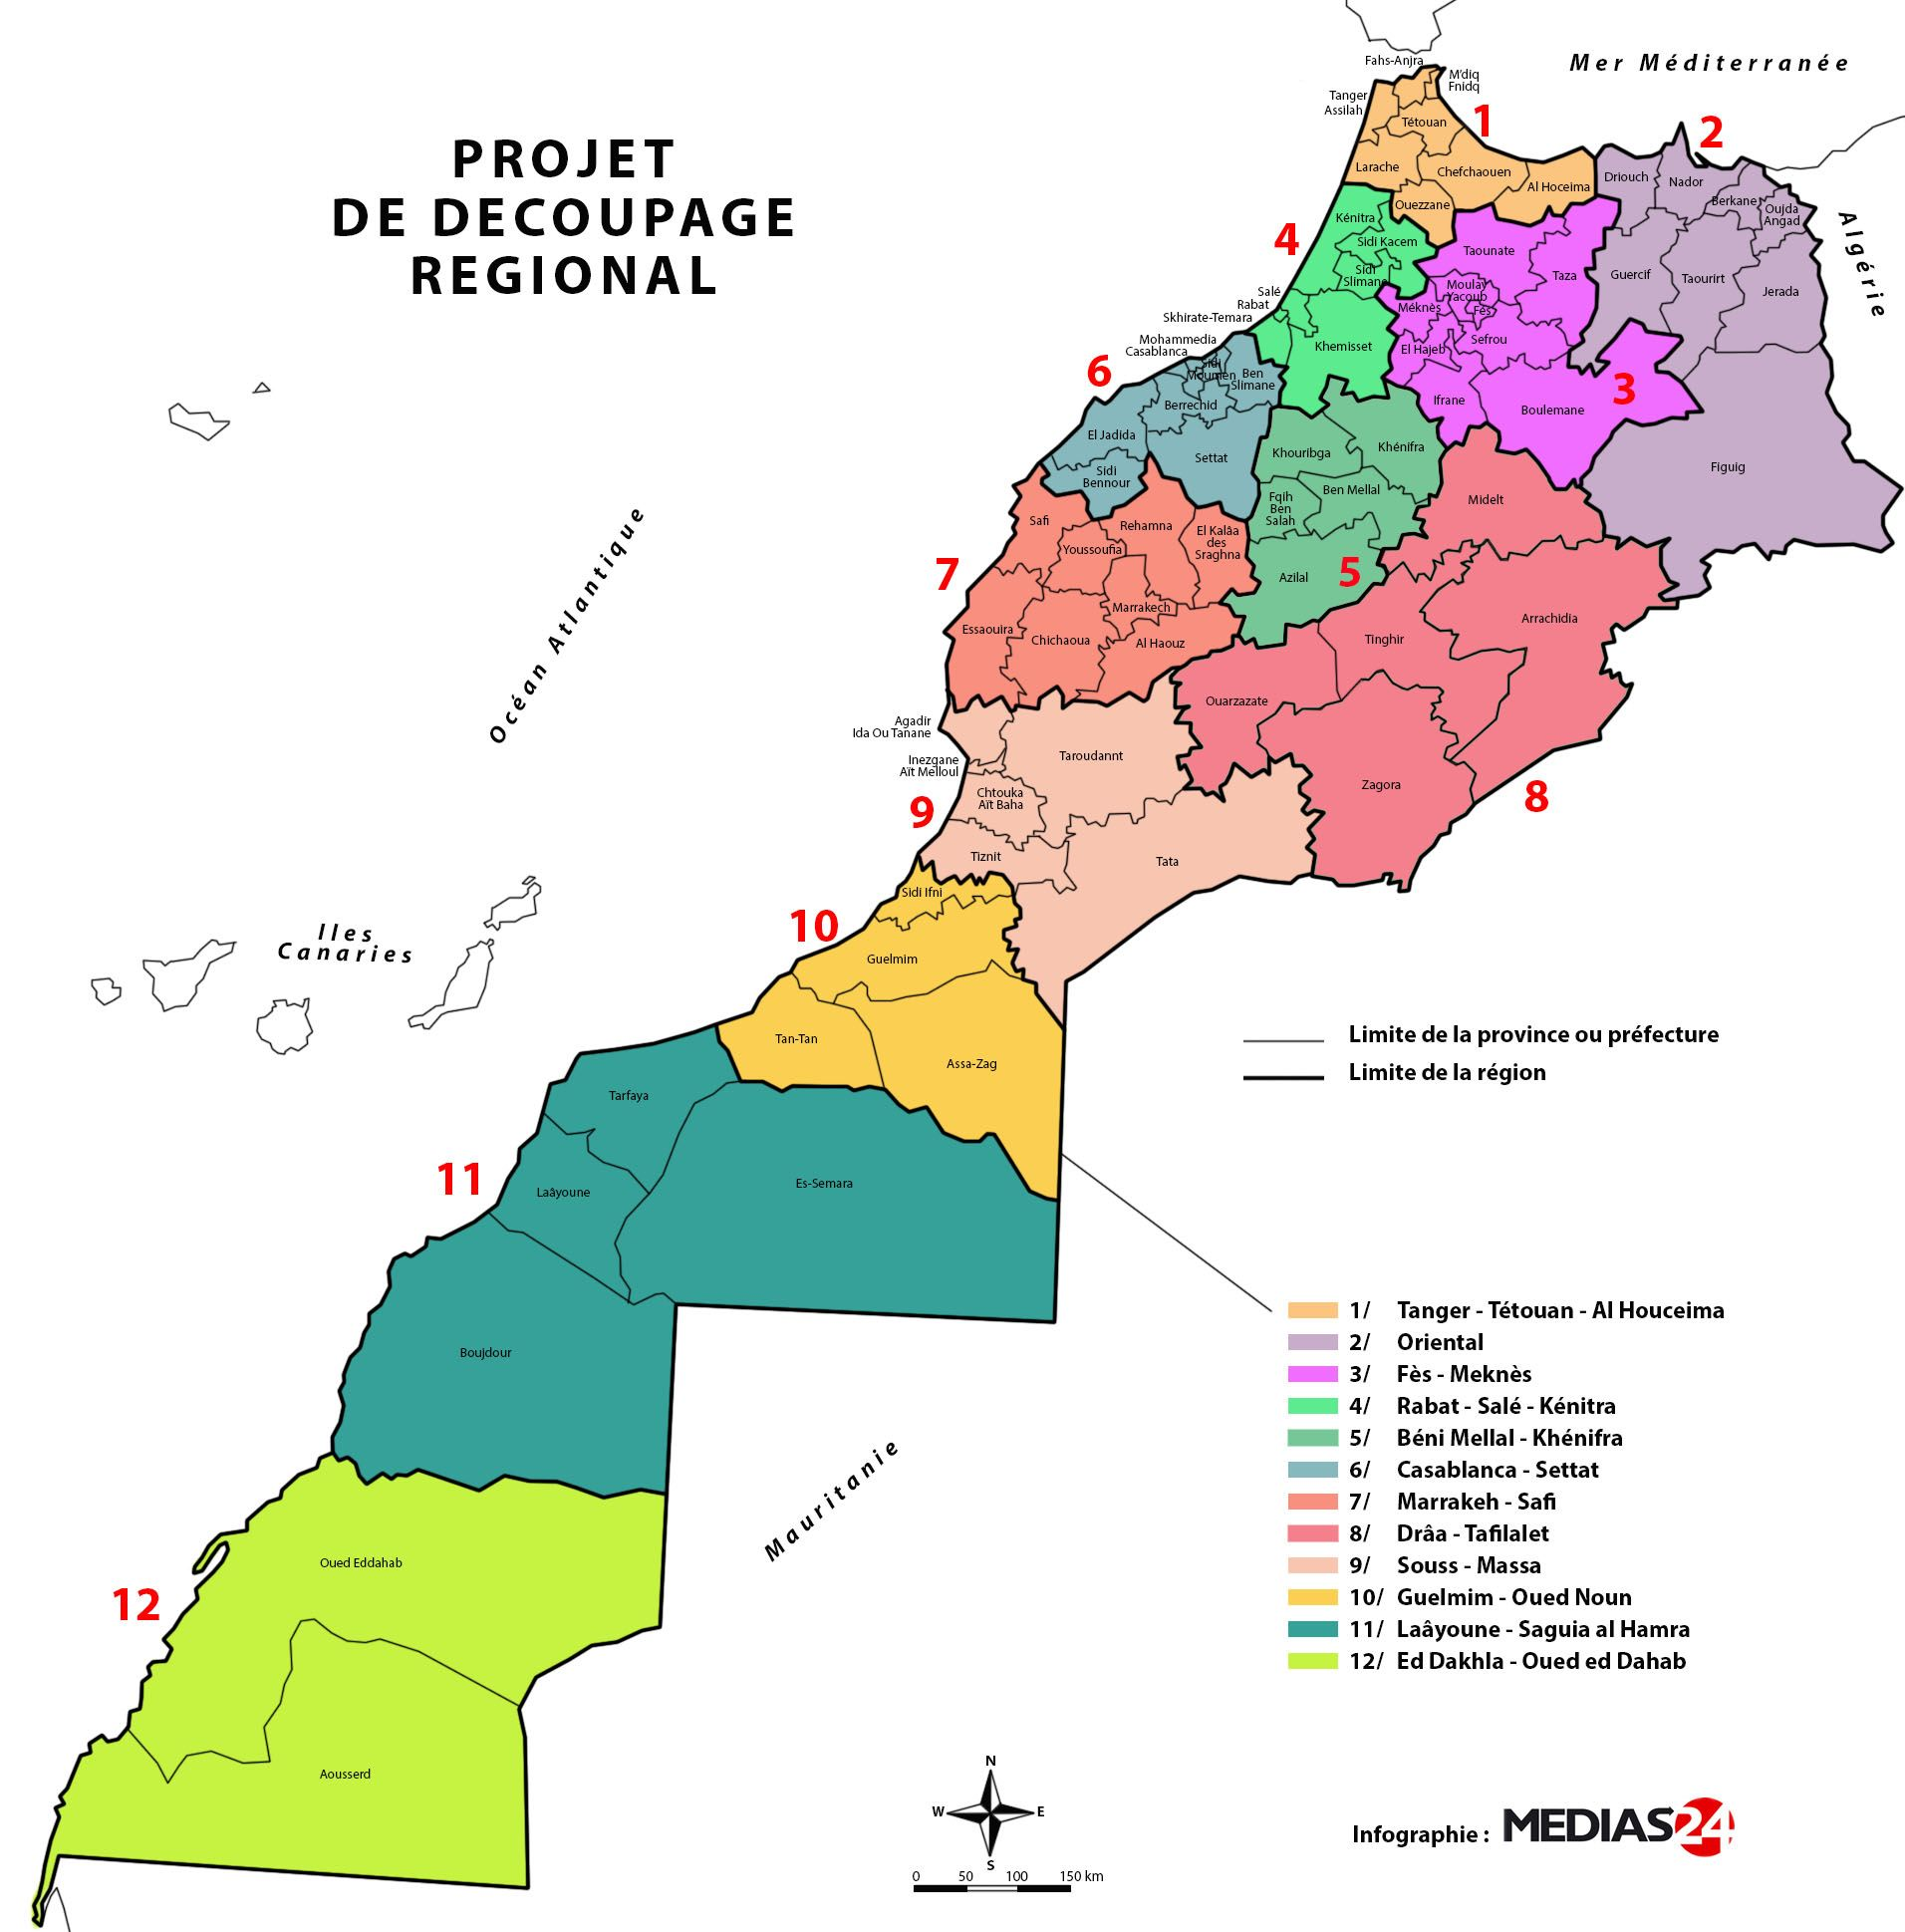 Nouvelle Carte Des Regions Du Maroc 2015 Jpg 1912 1939 Morocco Map Map Morocco